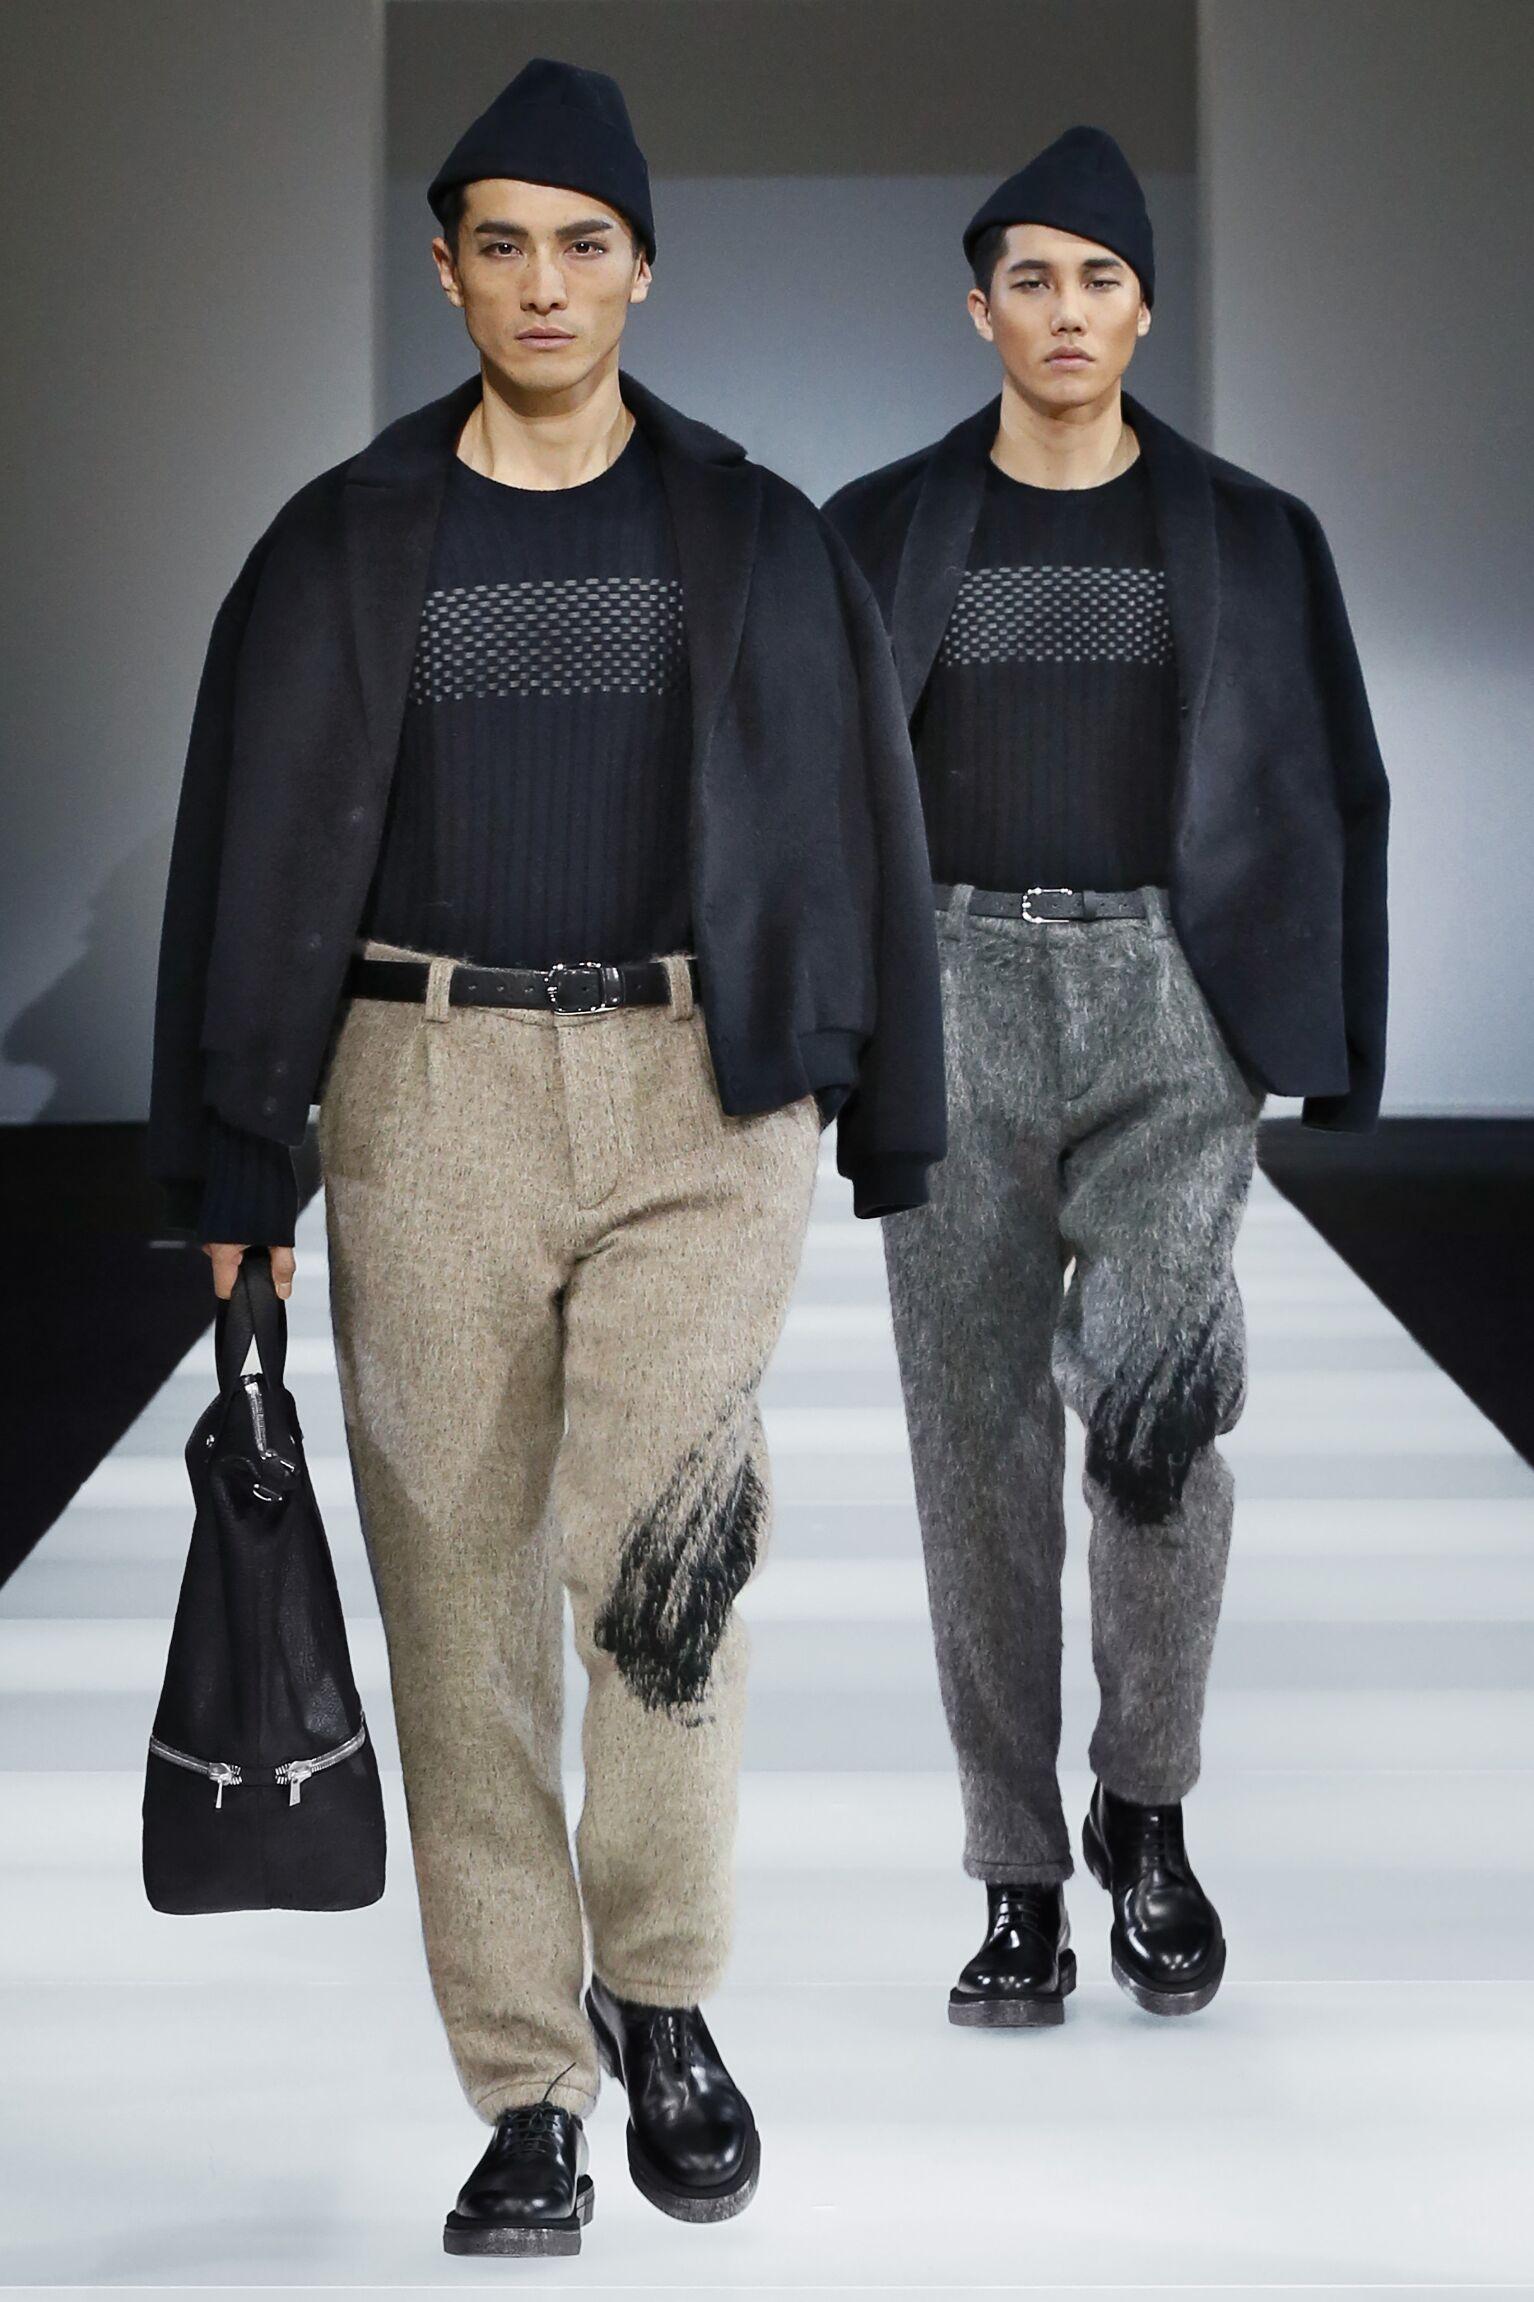 Winter Trends 2015 Man Emporio Armani Collection